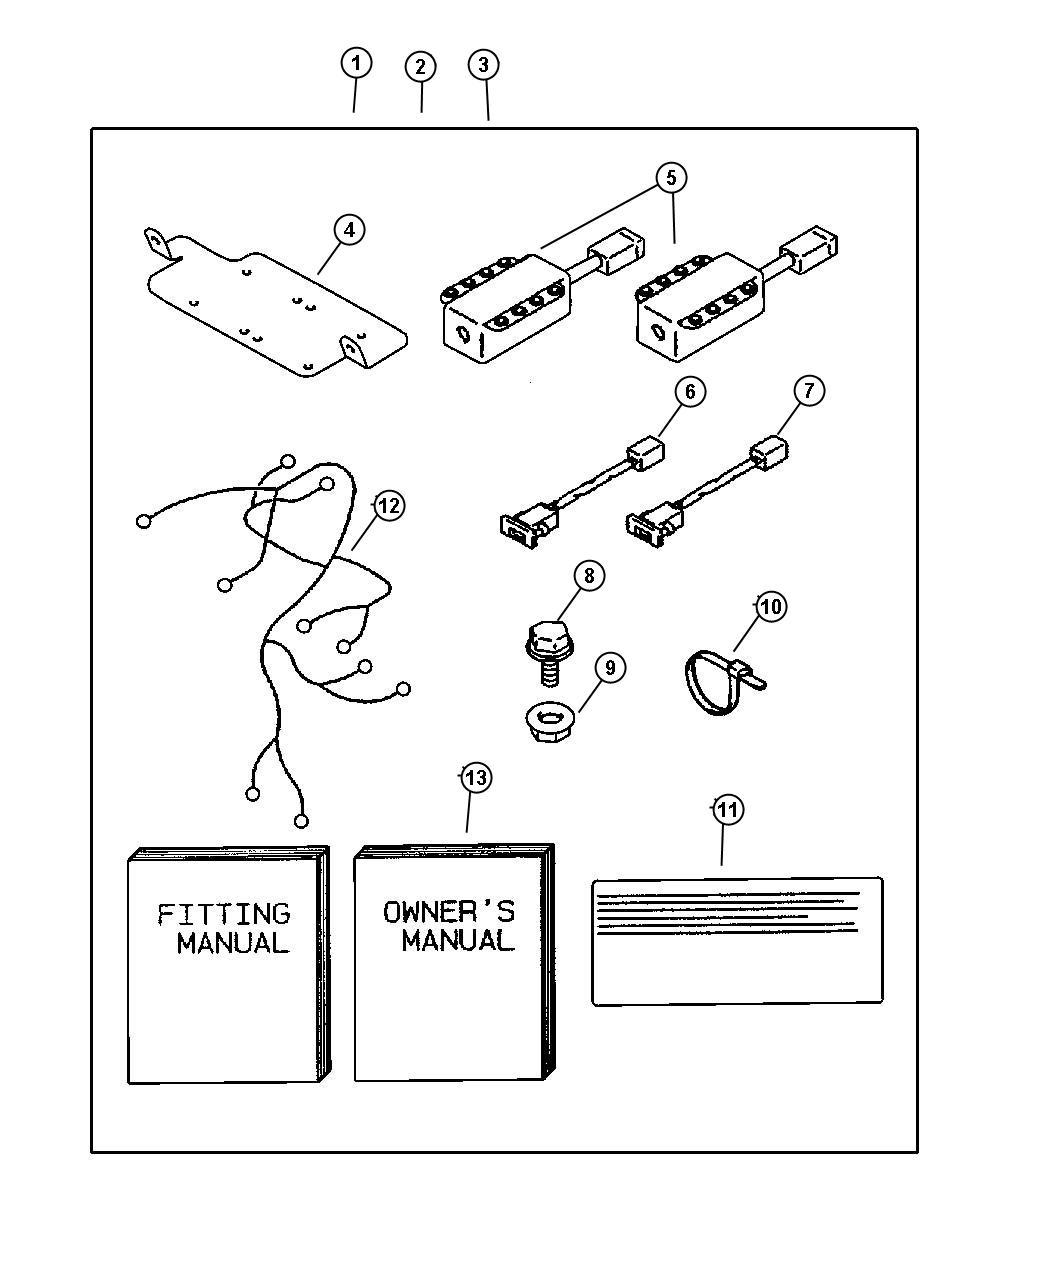 Chrysler Sebring Owners manual. Air bag cutoff switch